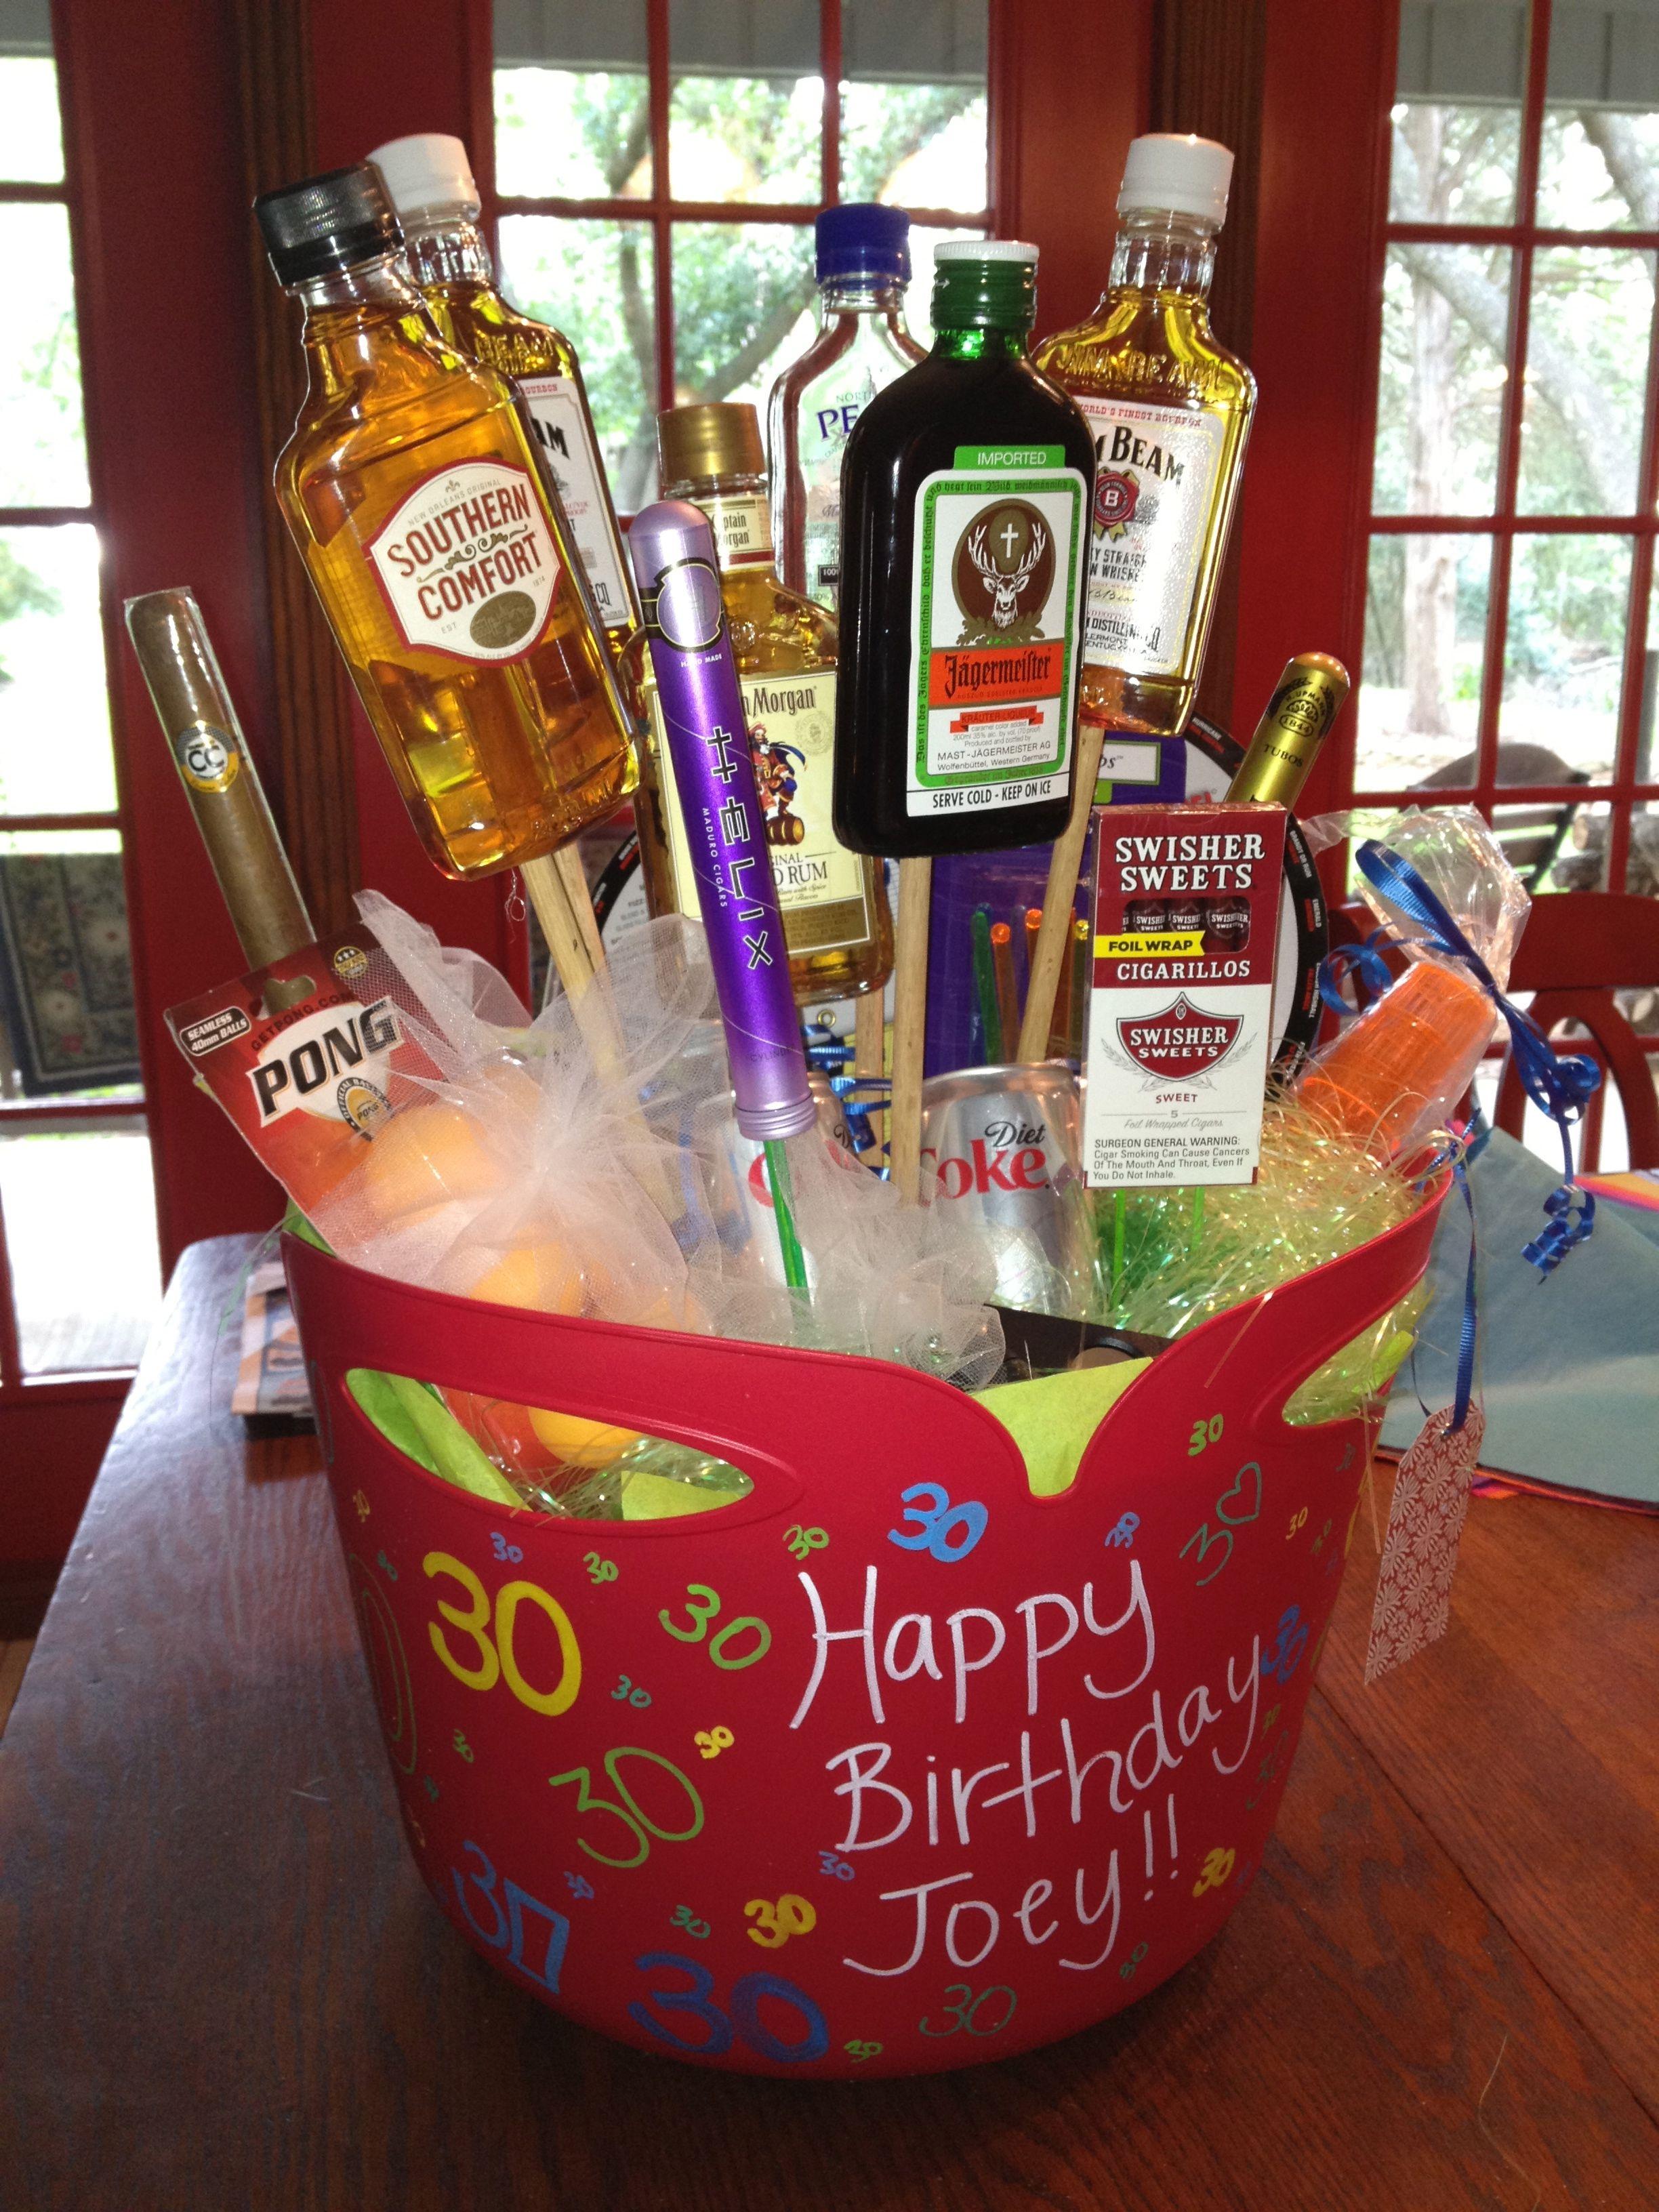 Joeys 30th Birthday flowers for a man  Birthday Ideas  30th birthday parties Birthday